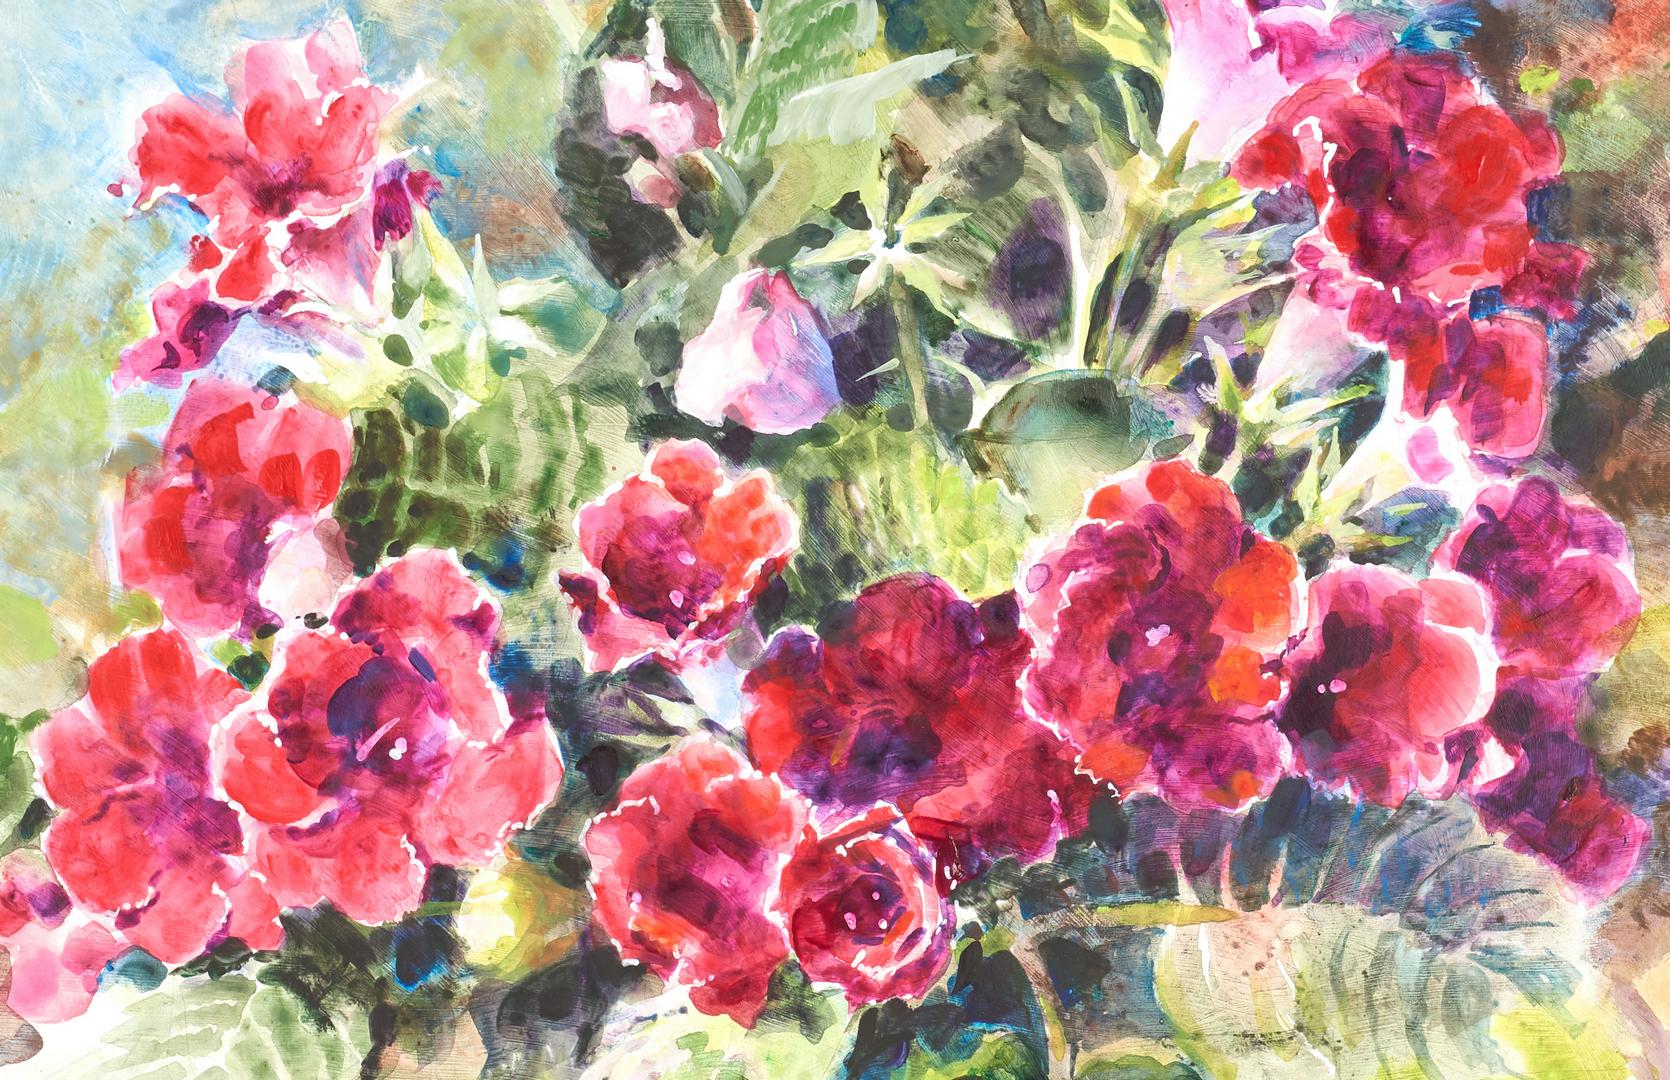 Lot 655: 2 Southern Still Lifes by Elizabeth Brandon, Josie Van Gent Edell